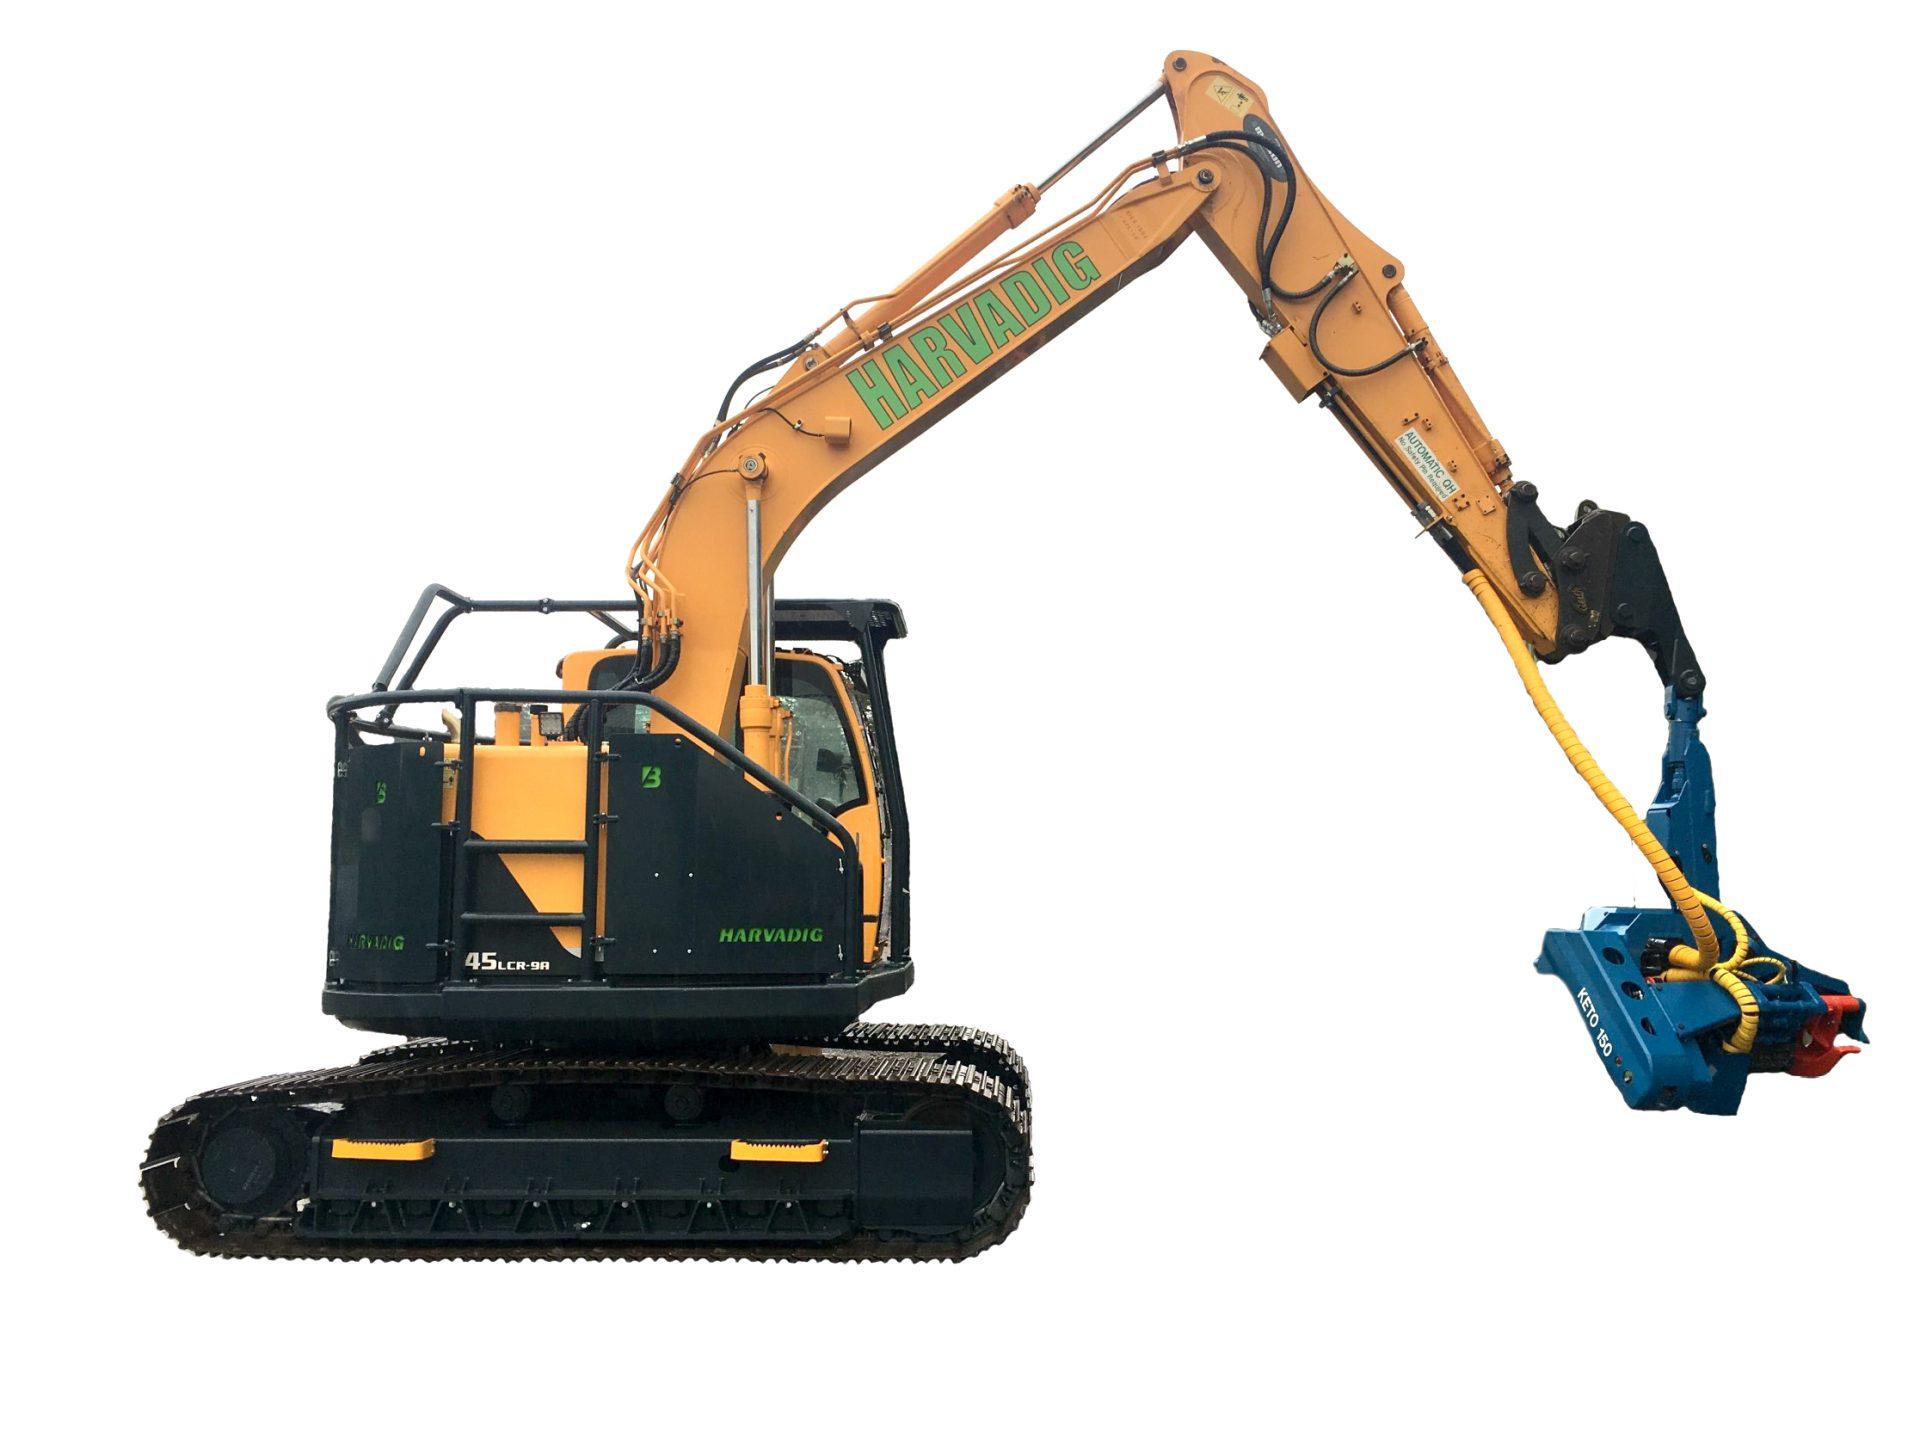 HarvaDig - Forestry Excavator Conversion - Jas P Wilson